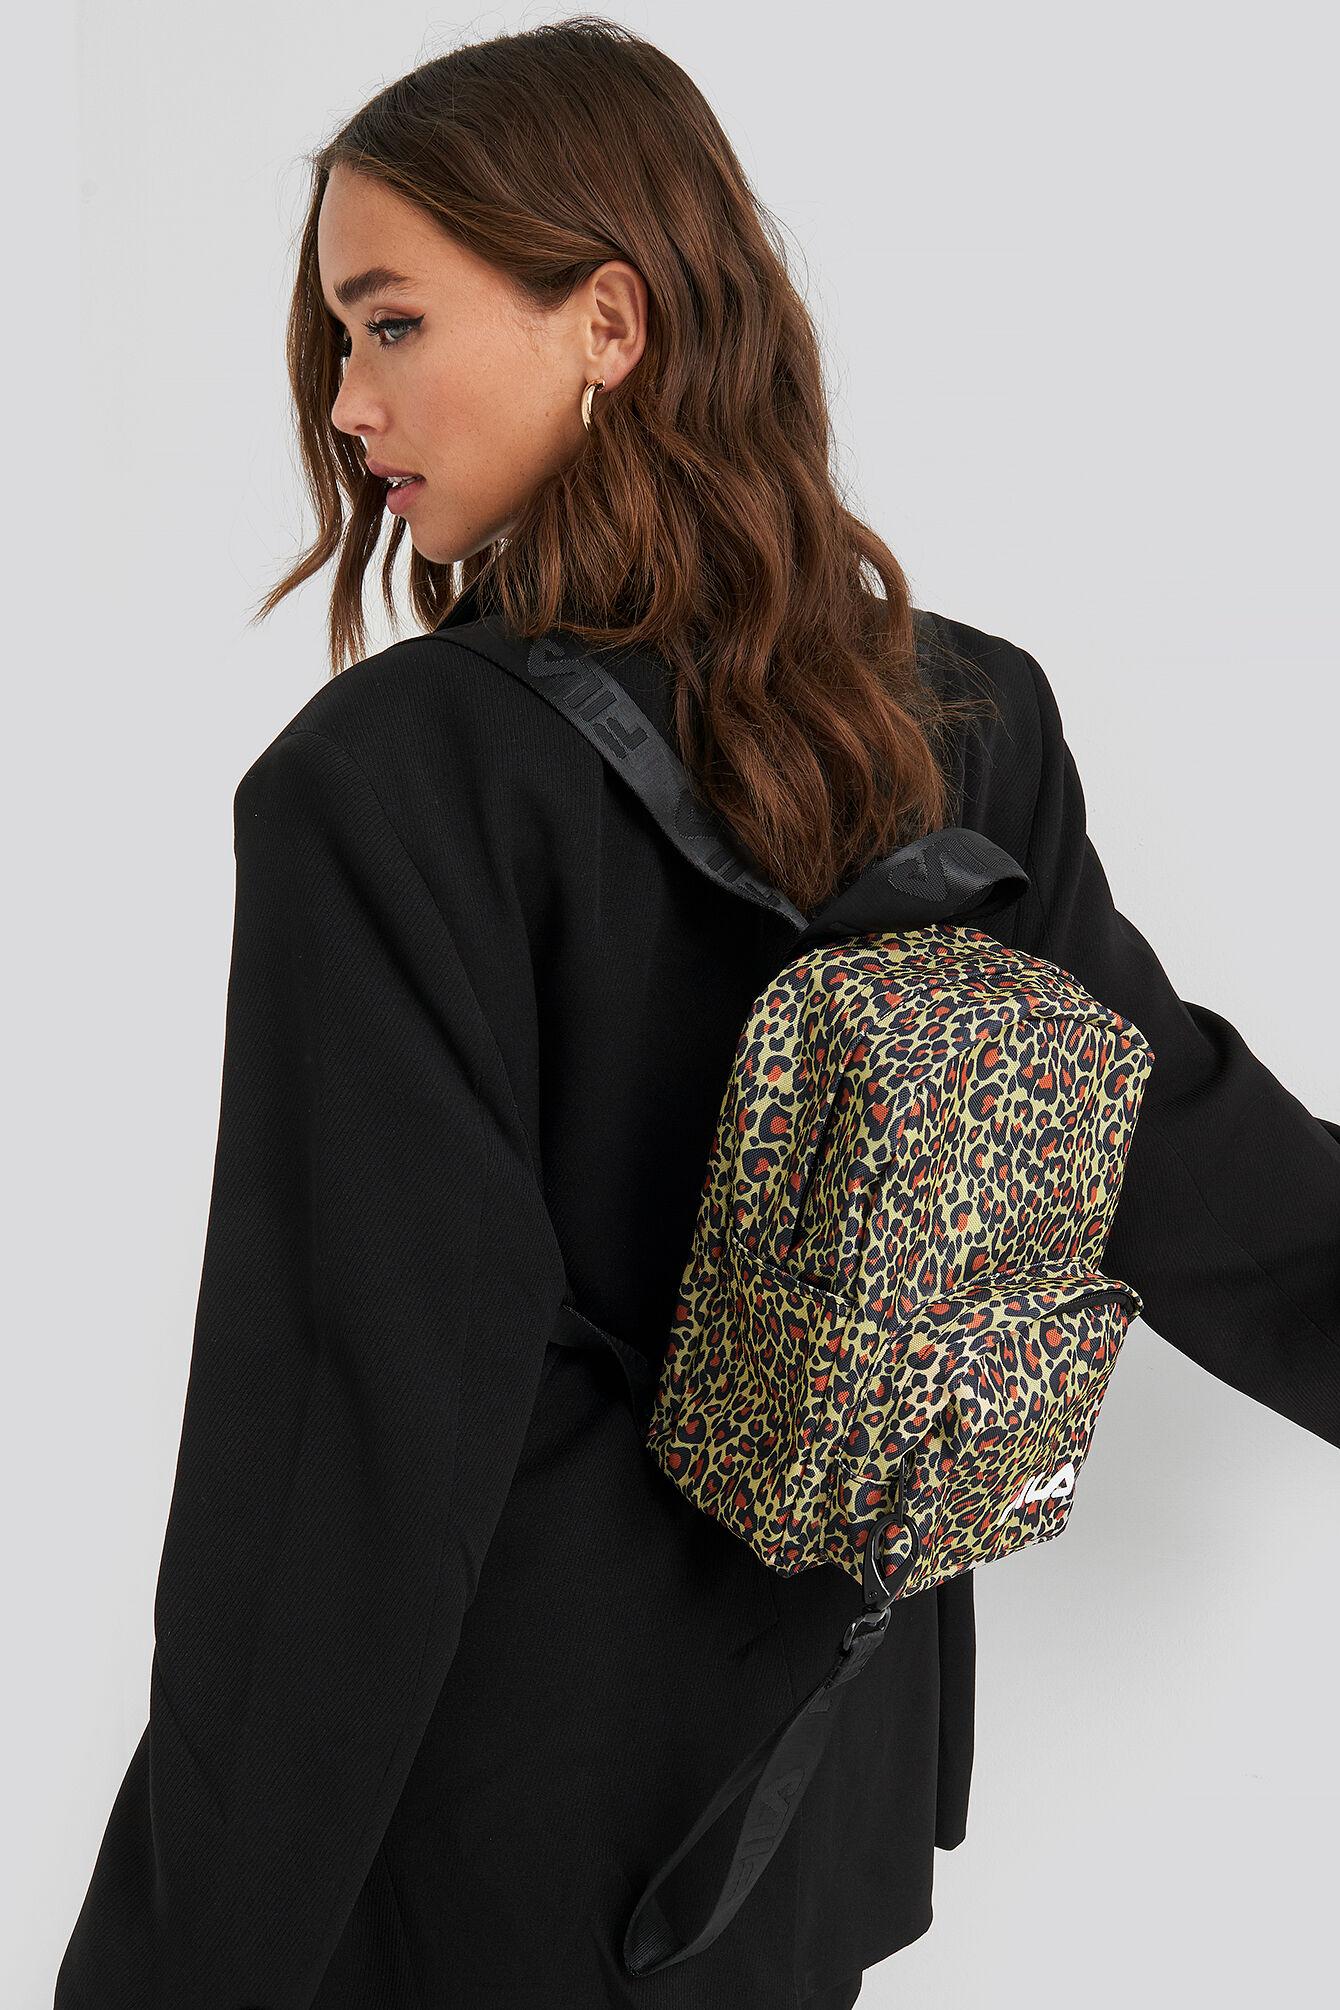 FILA Mini Strap Backpack Varberg - Multicolor  - Size: One Size